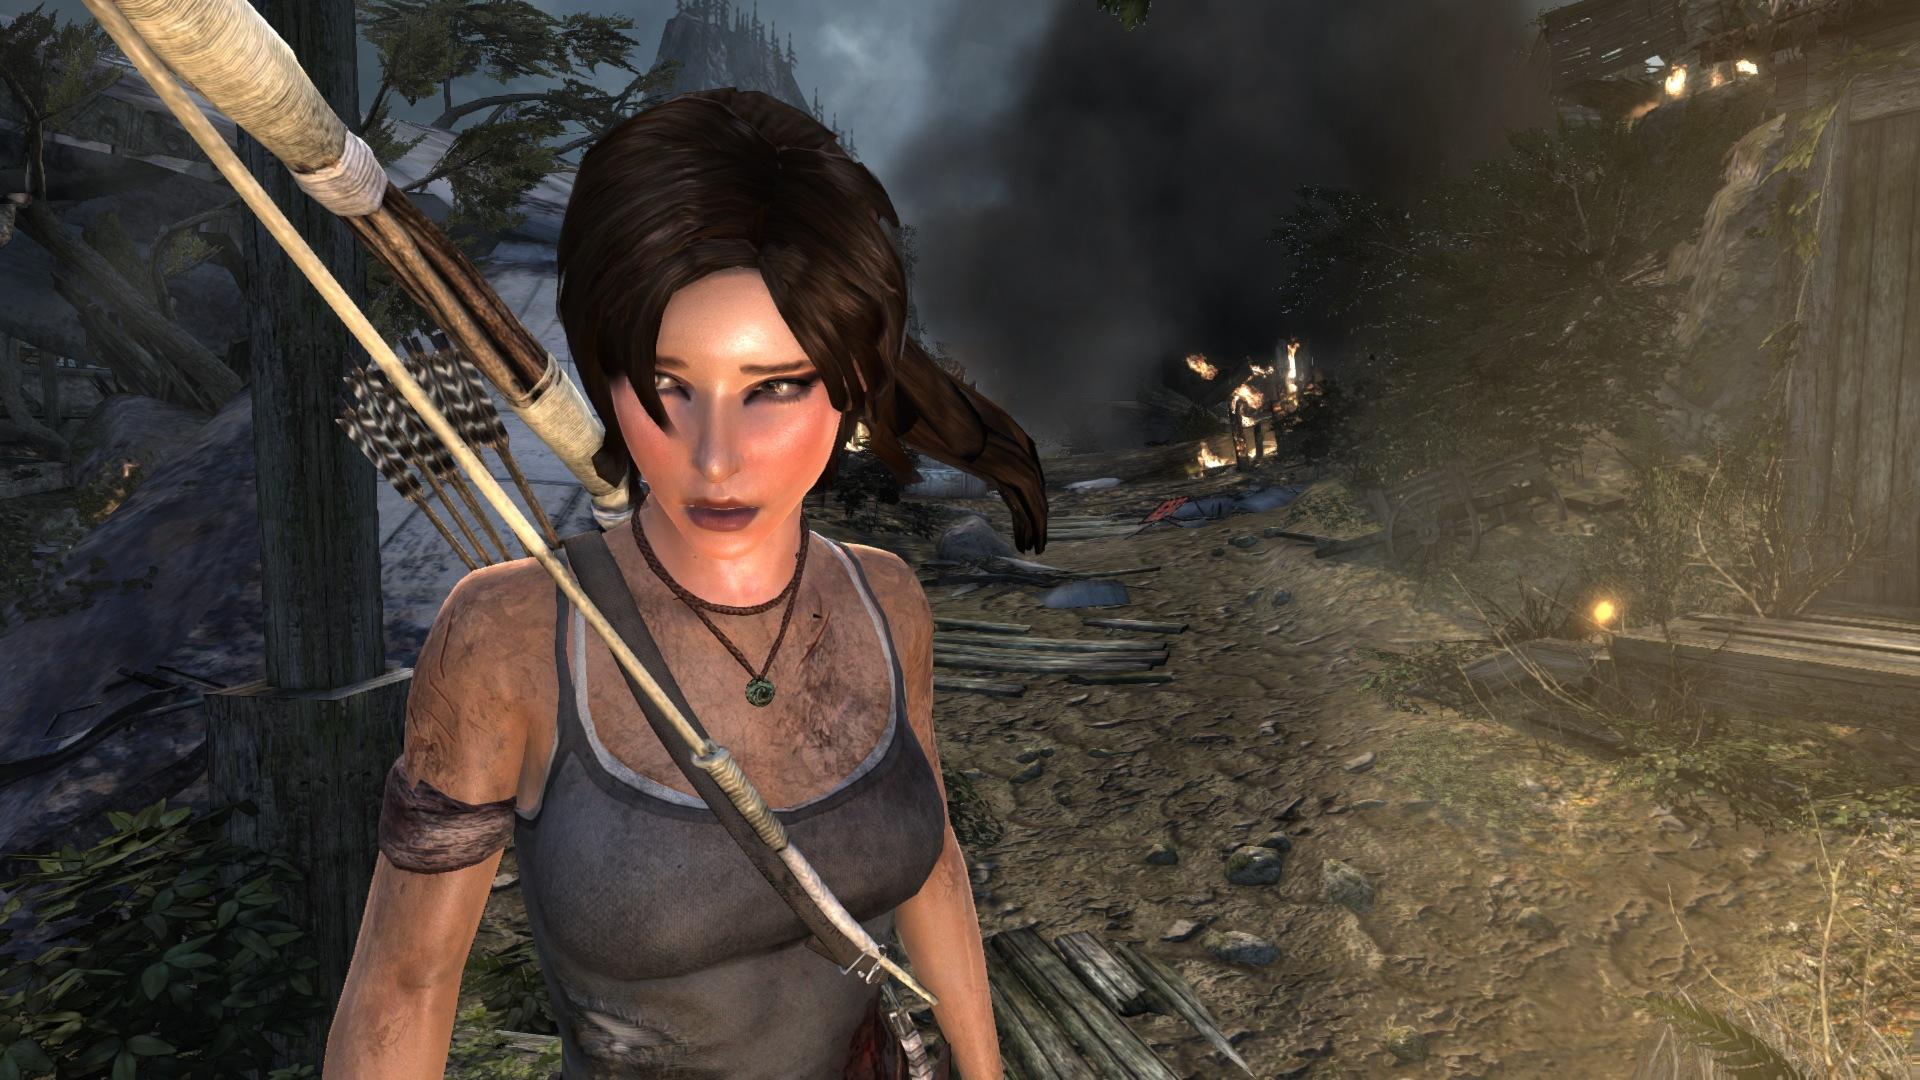 Tomb Raider 2013 Modding Thread Costumes Texturing